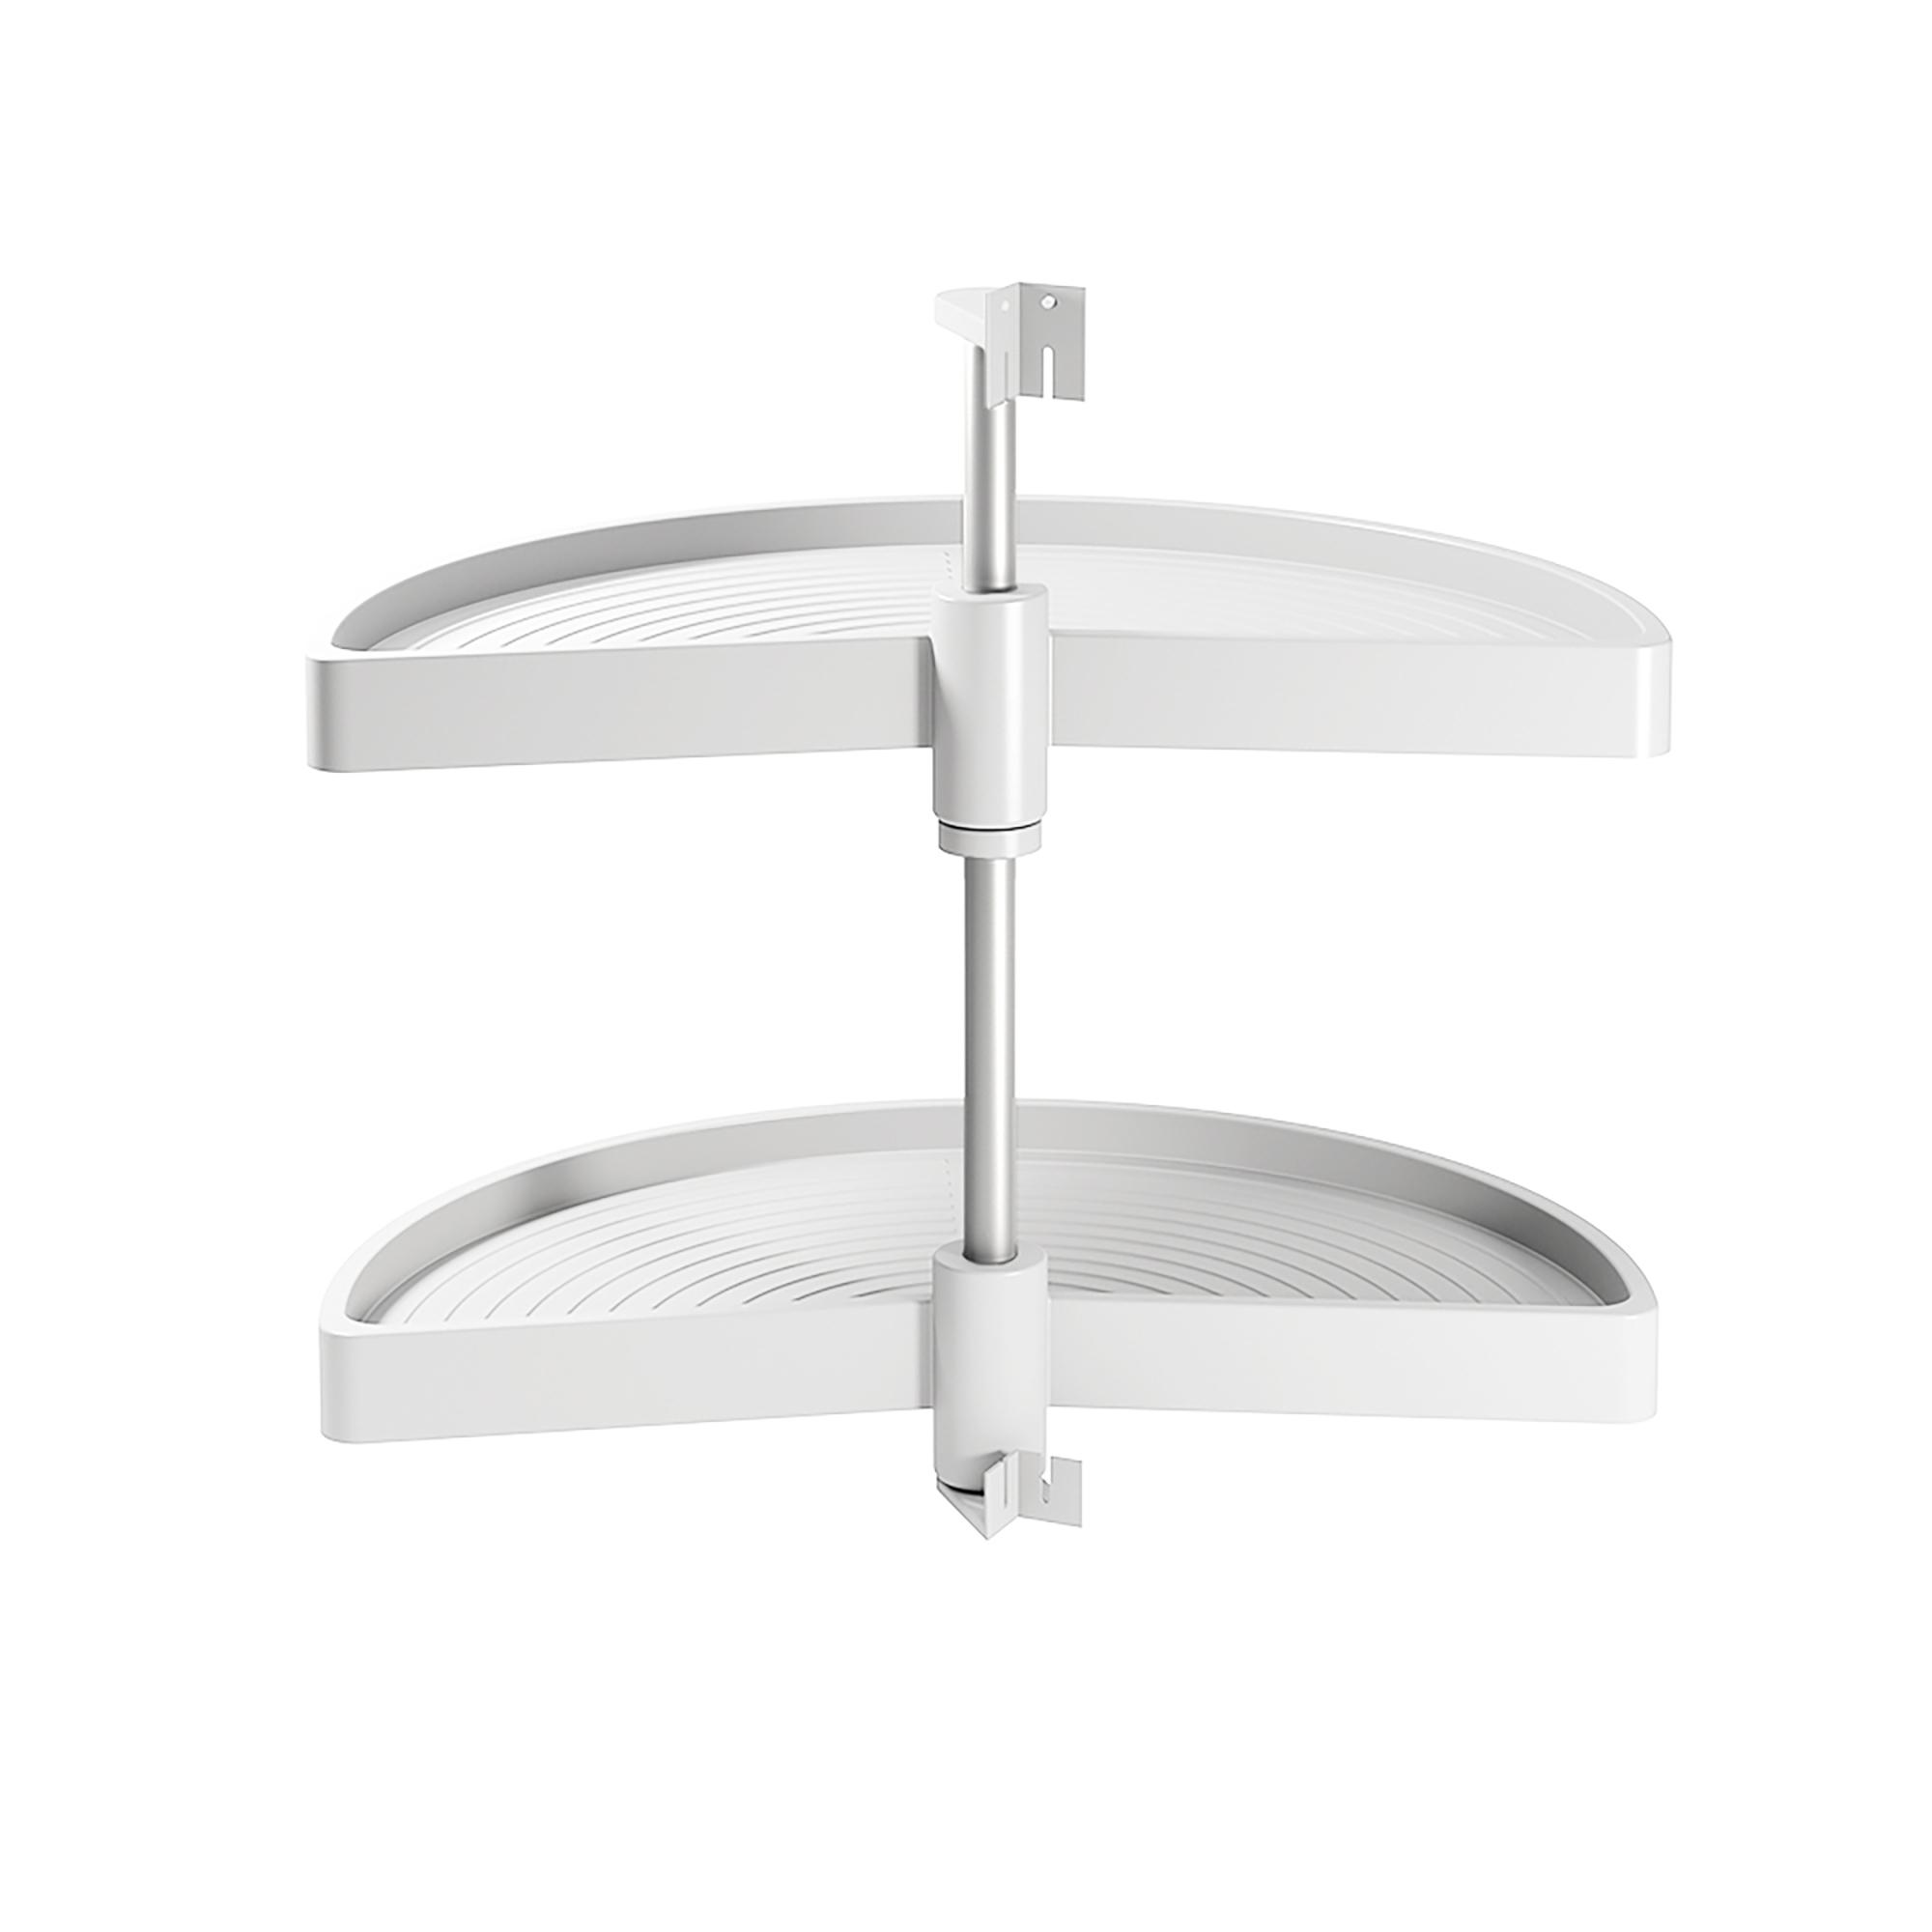 Emuca Cestello girevole per mobile da cucina, 180º, modulo 900 mm, Plastica, Bianco